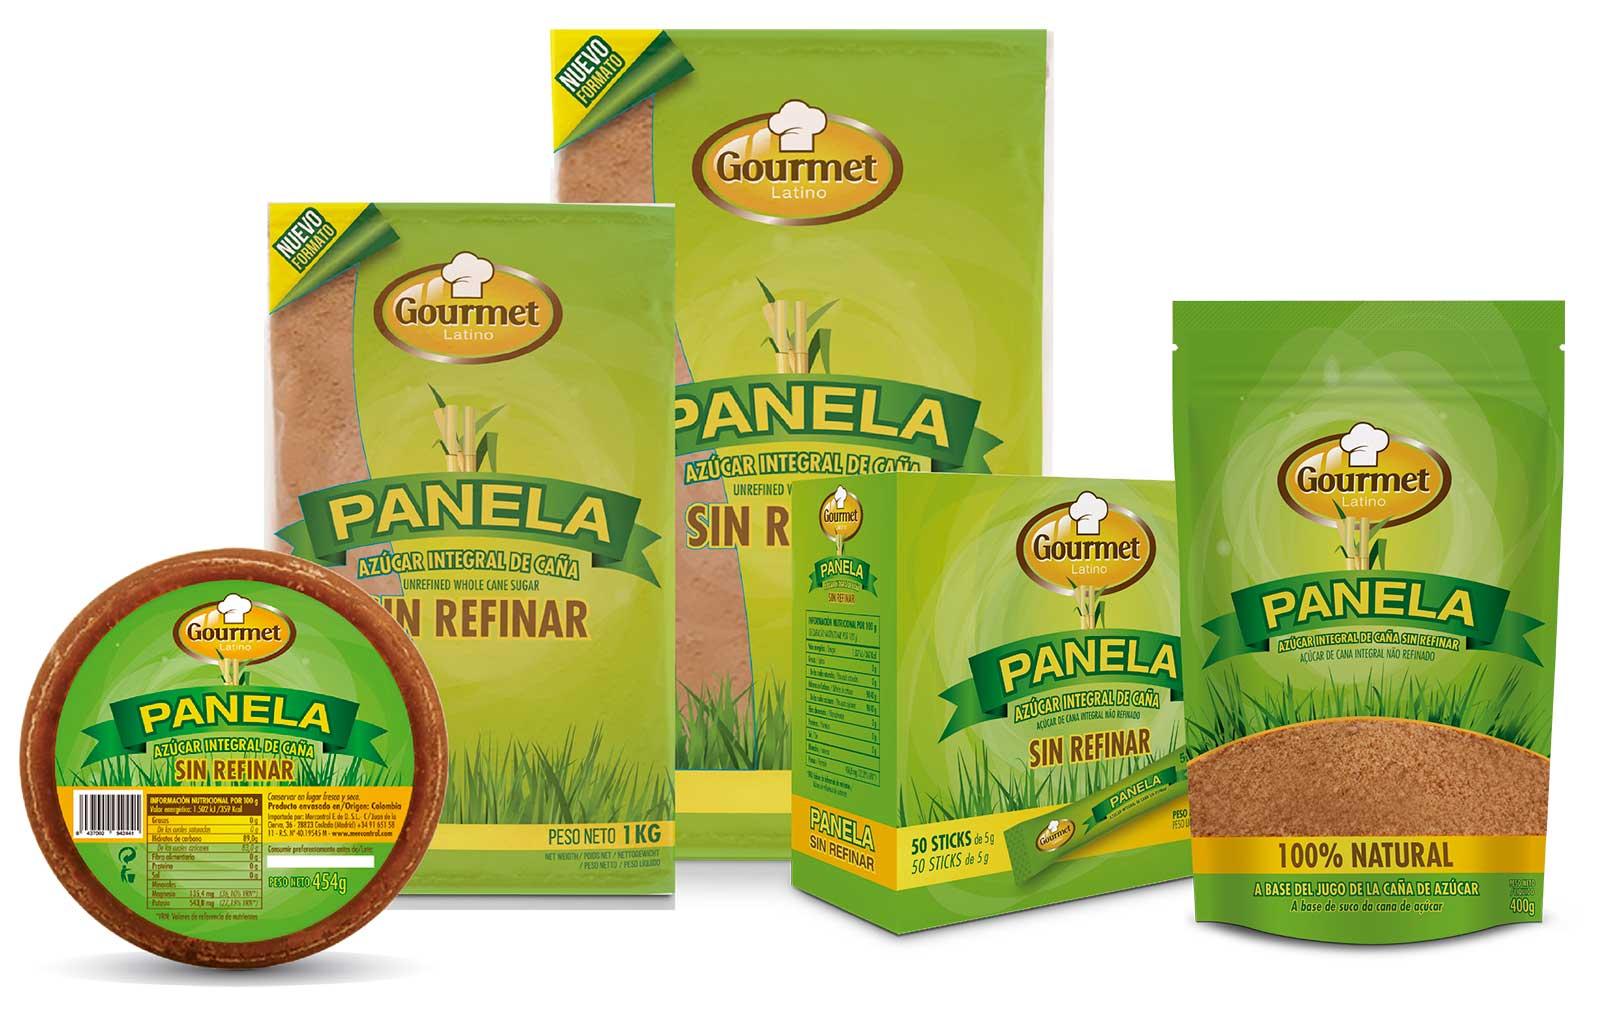 Panela Gourmet Latino